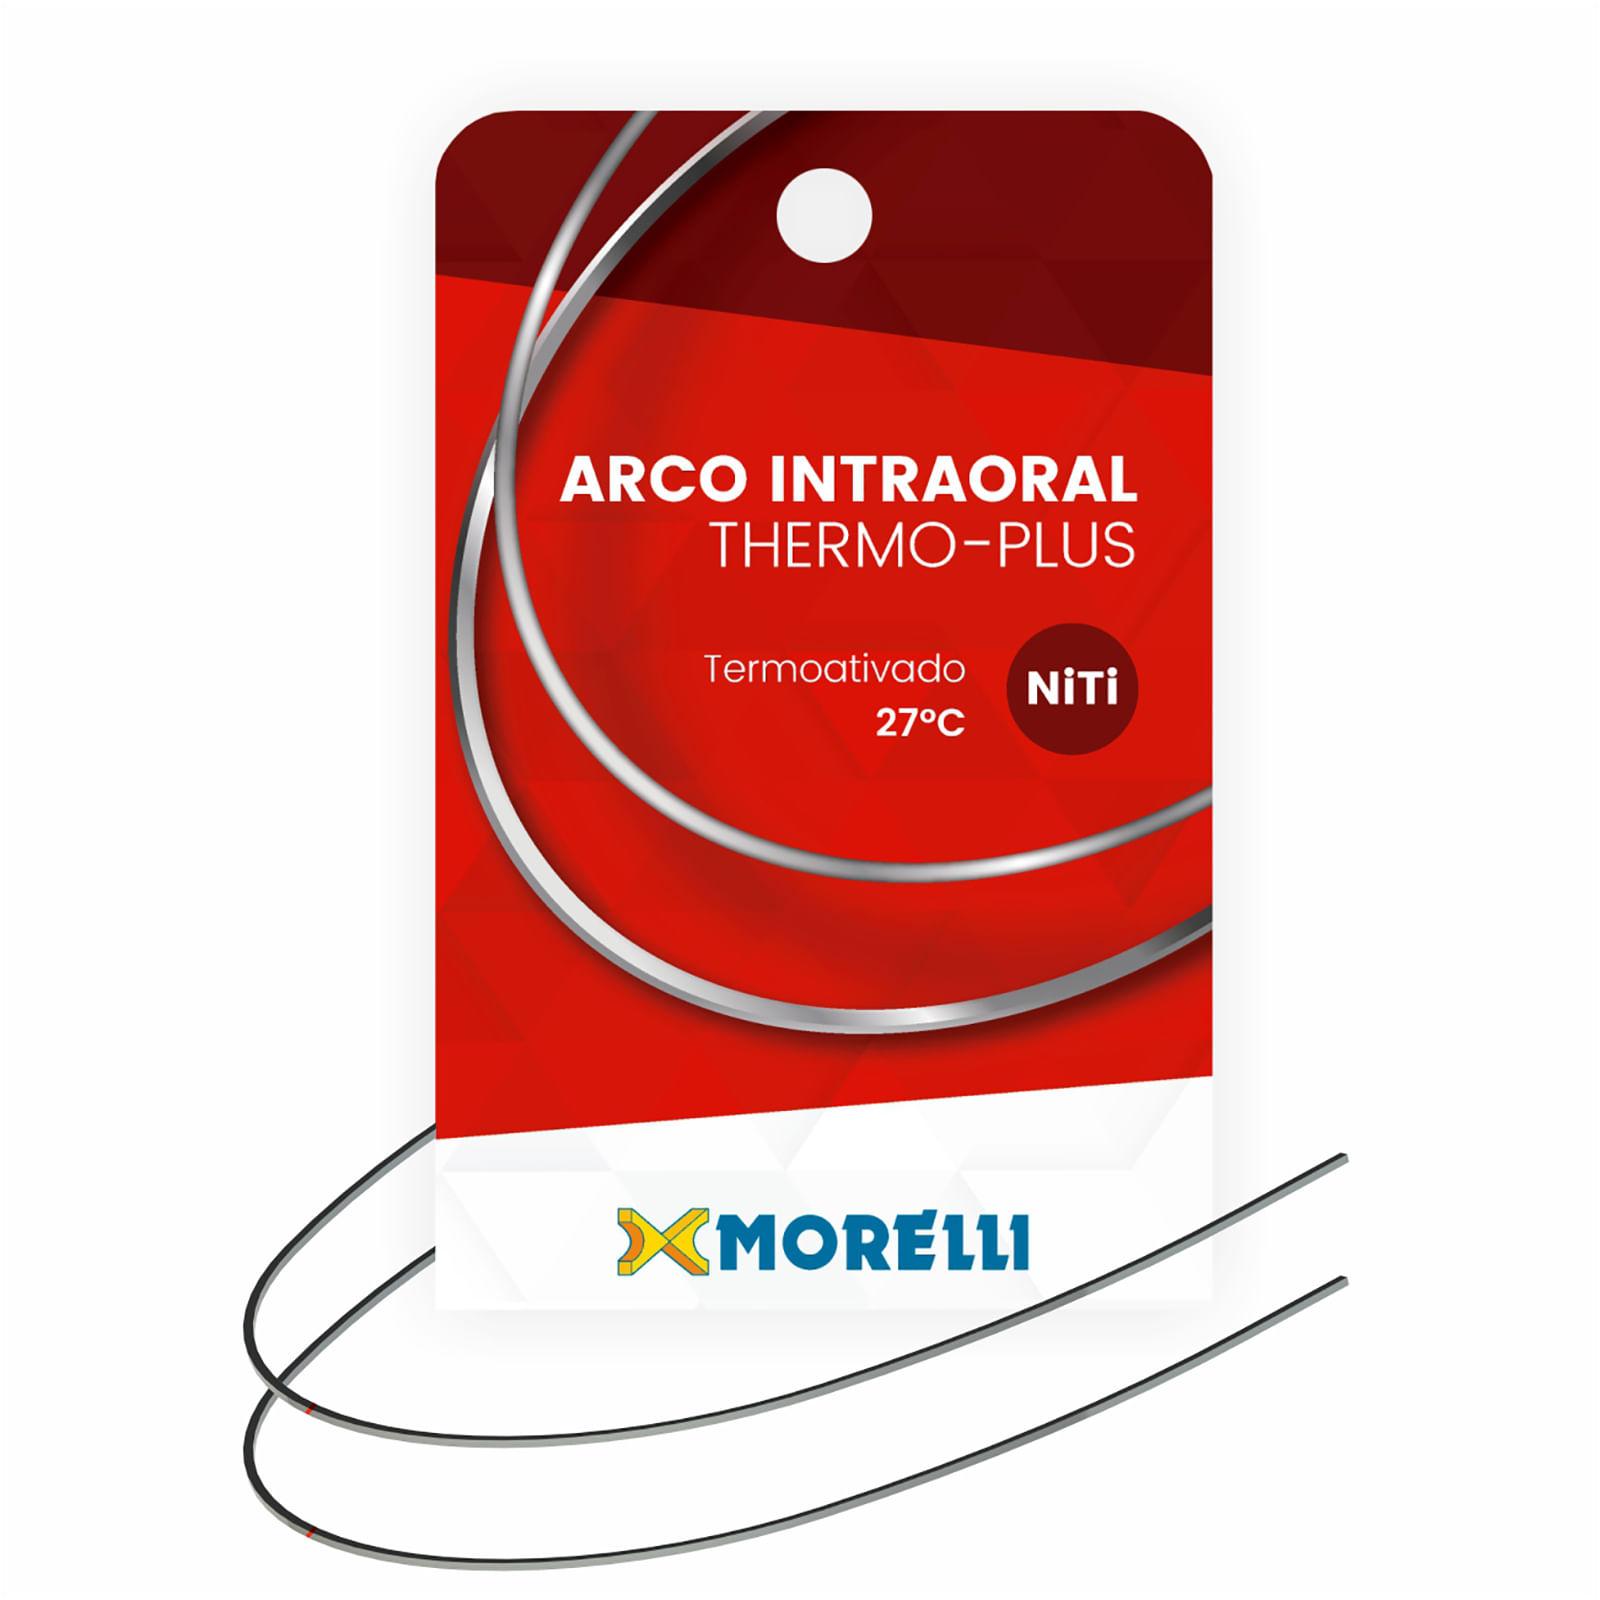 ARCO-NITINOL-ORTODONTICO-INTRAORAL-THERMO-PLUS-INFERIOR-P---NITI---RETANGULAR-0.53X0.63MM--.021-X.025-----MORELLI